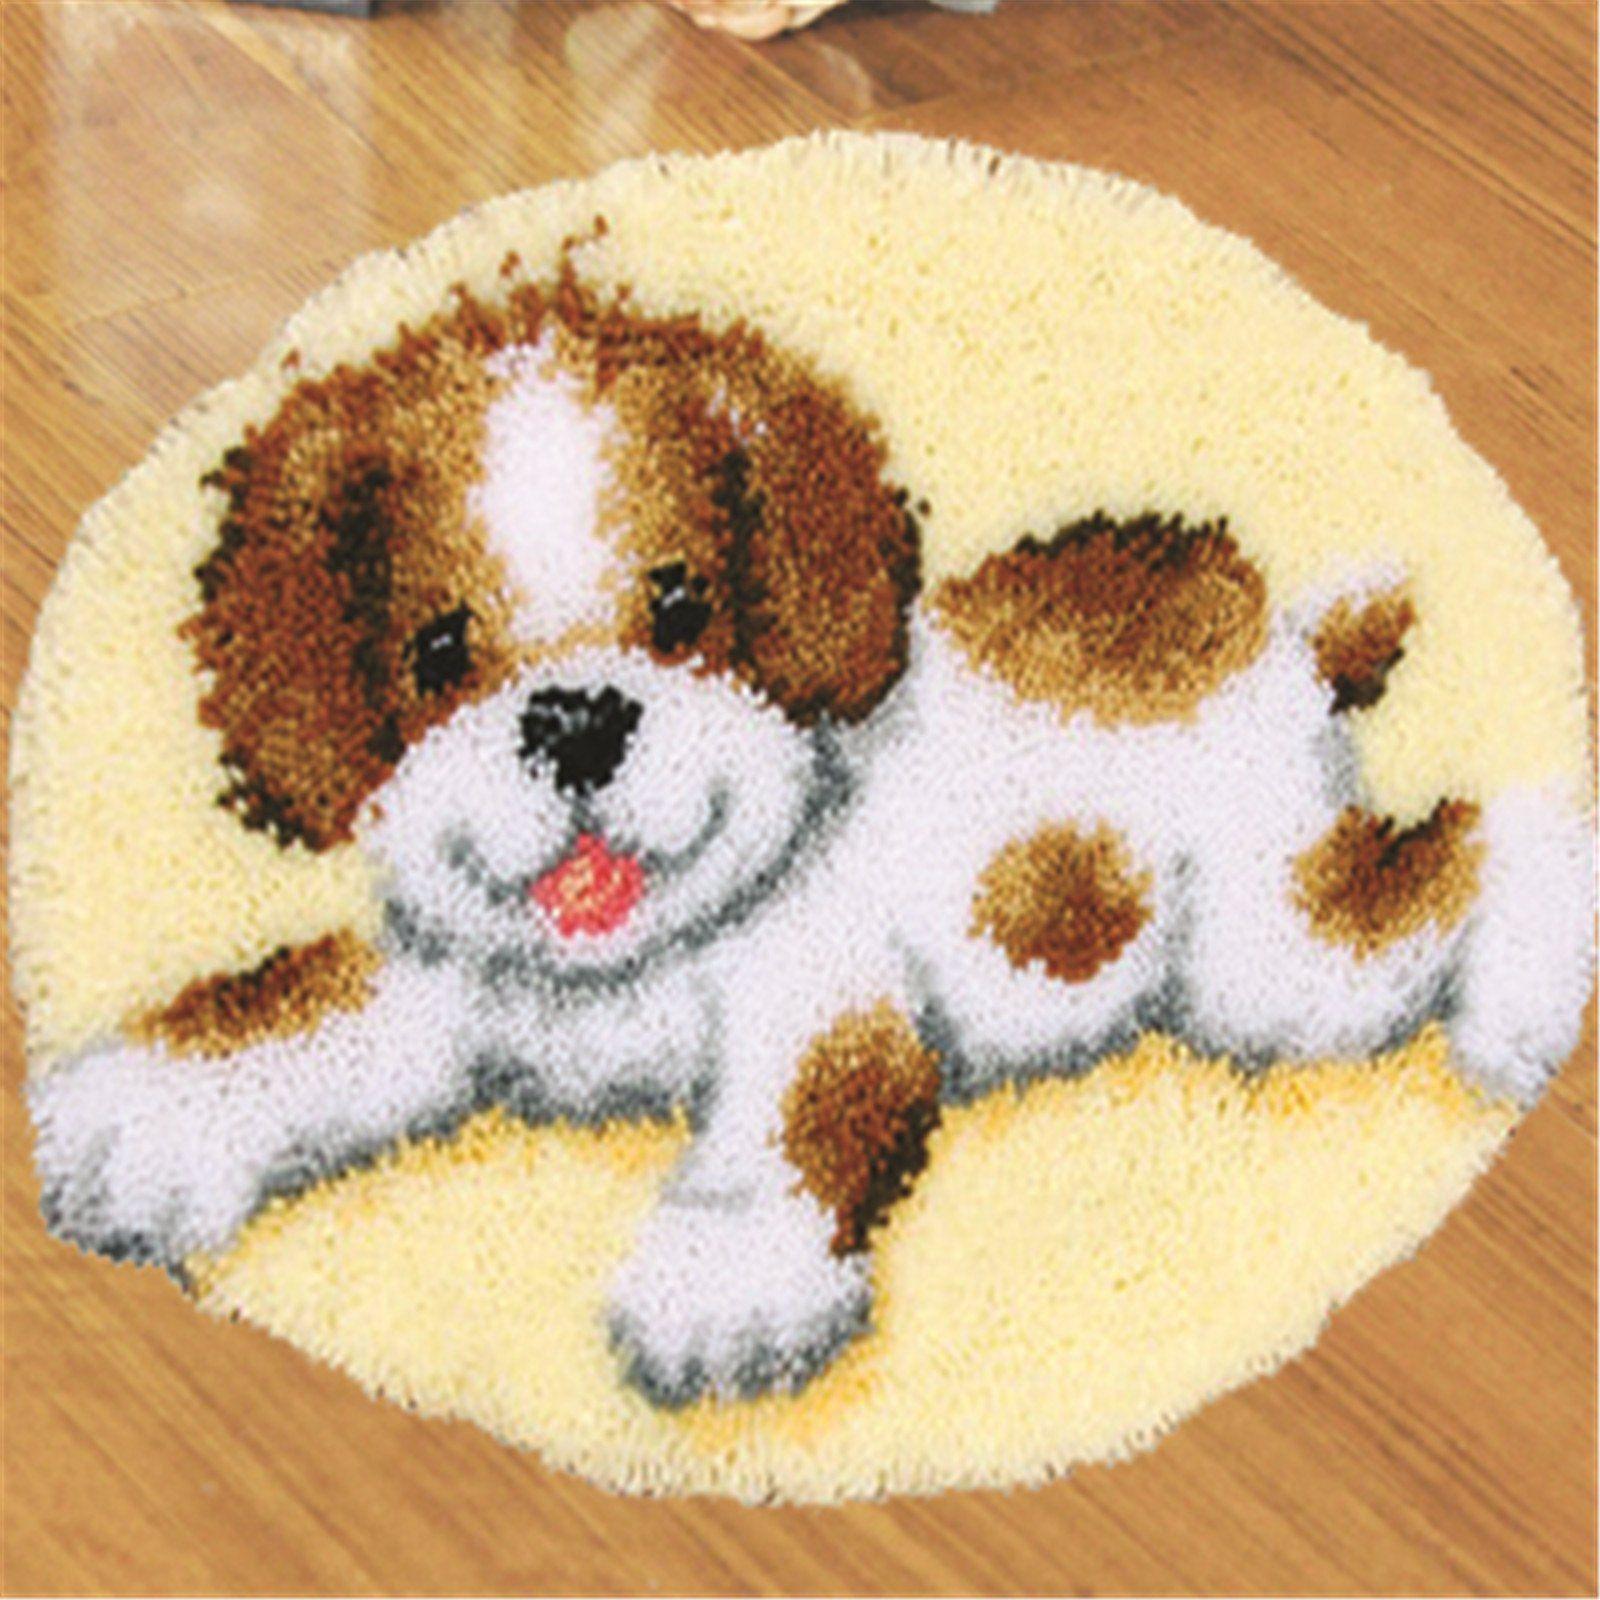 Puppies Dog Rug Latch Rug Hook Kit DIY Mat Yarn Cushion Embroidery Home Decor